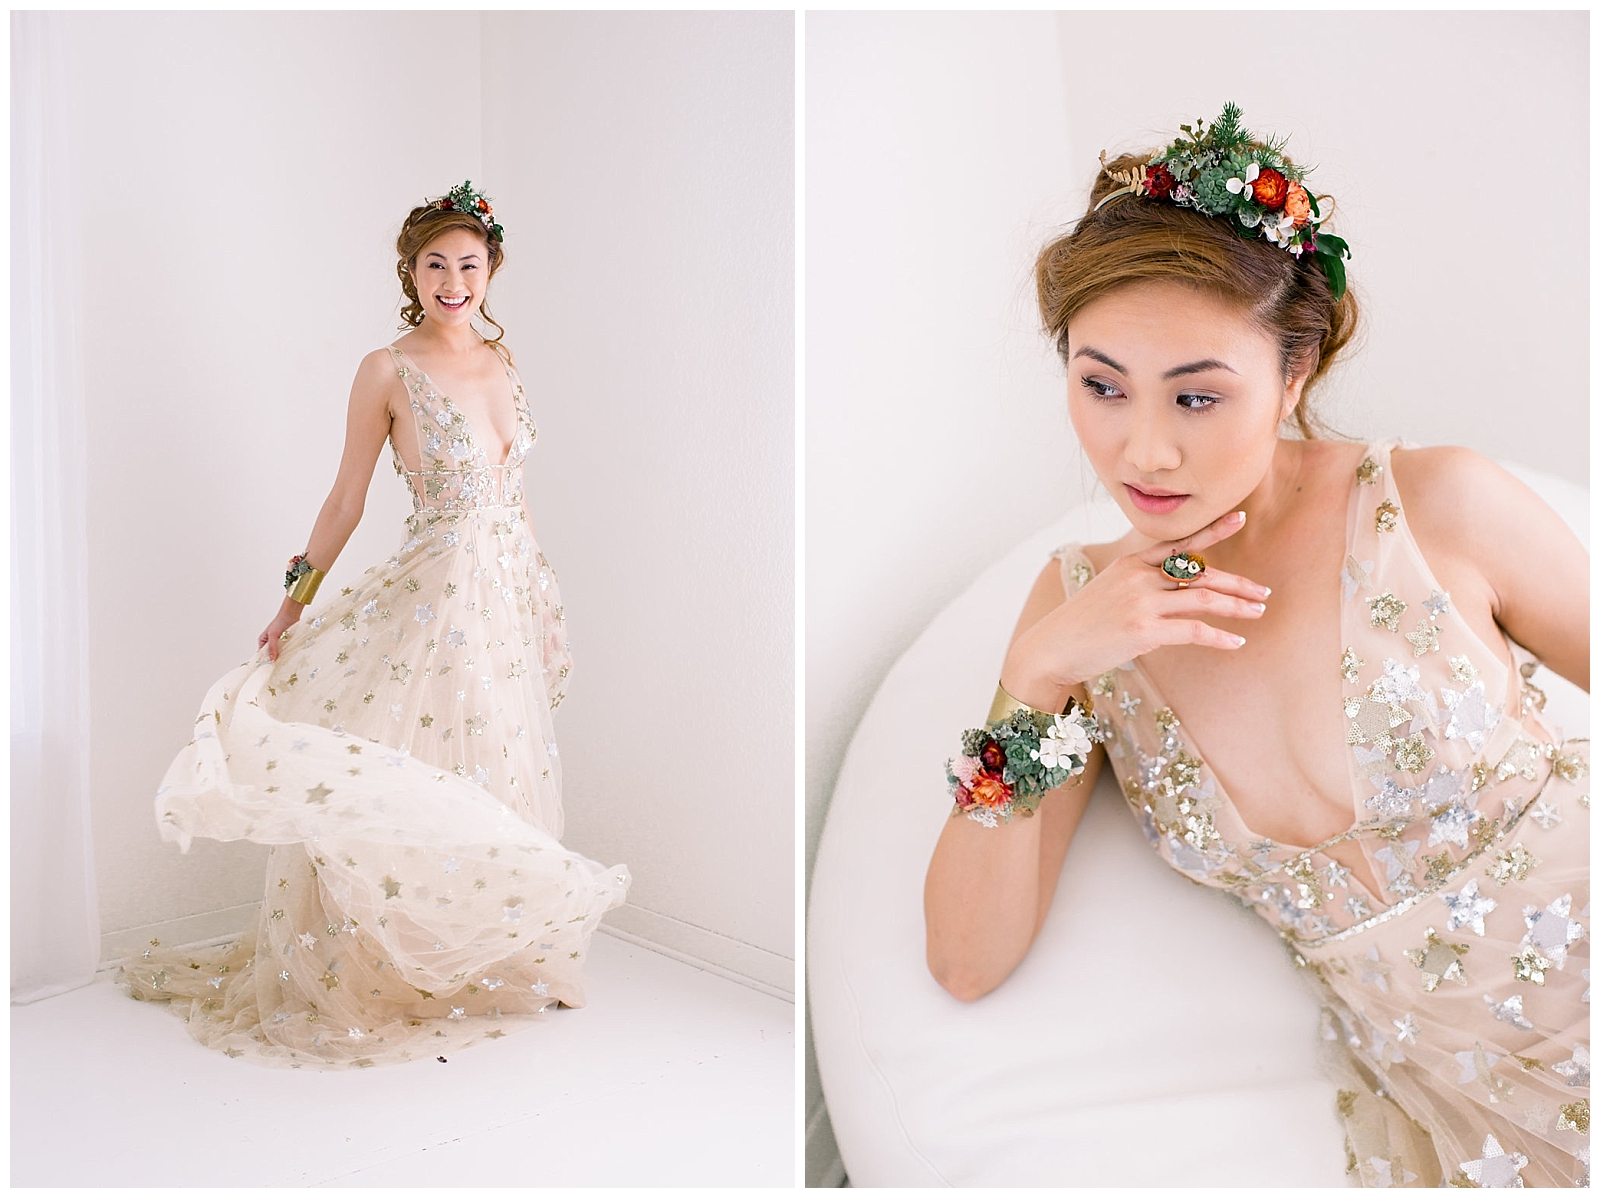 Living-Accessories-styled-shoot-de-joy-photography-epiphany-boutique-boho-dress.jpg